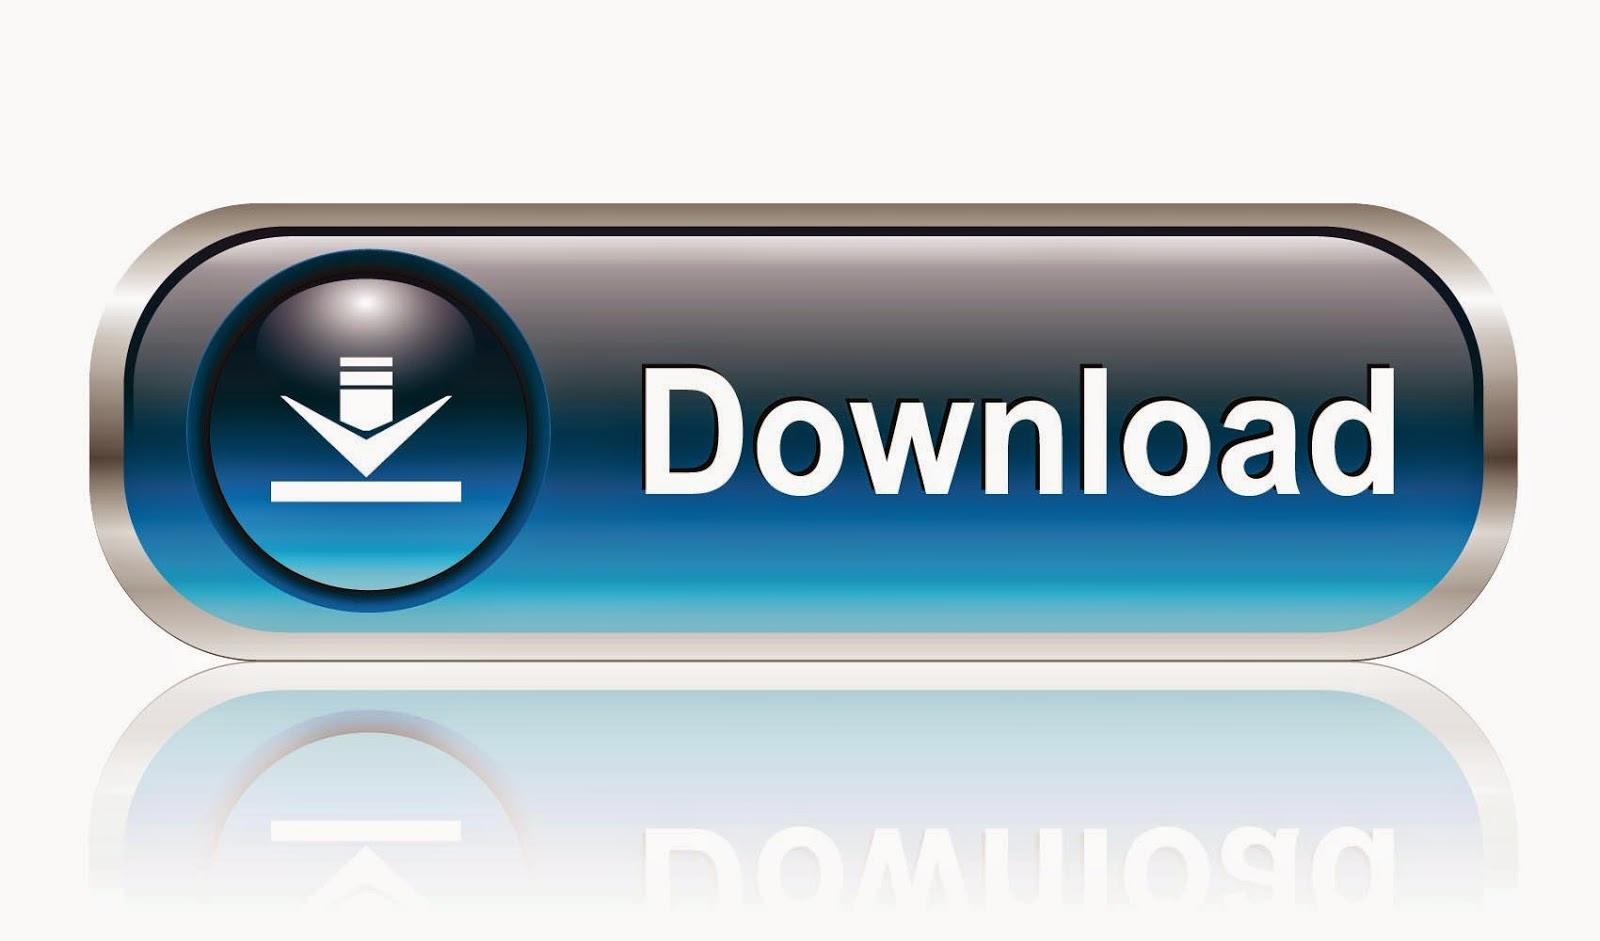 "<img src=""http://4.bp.blogspot.com/-Wl3QpiNGDXs/U1agH_FFq_I/AAAAAAAACZg/MPJS6cbIyiY/s1600/mypublicwifi.png"" alt=""MyPublicWifi 5.1 Free Download"" />"